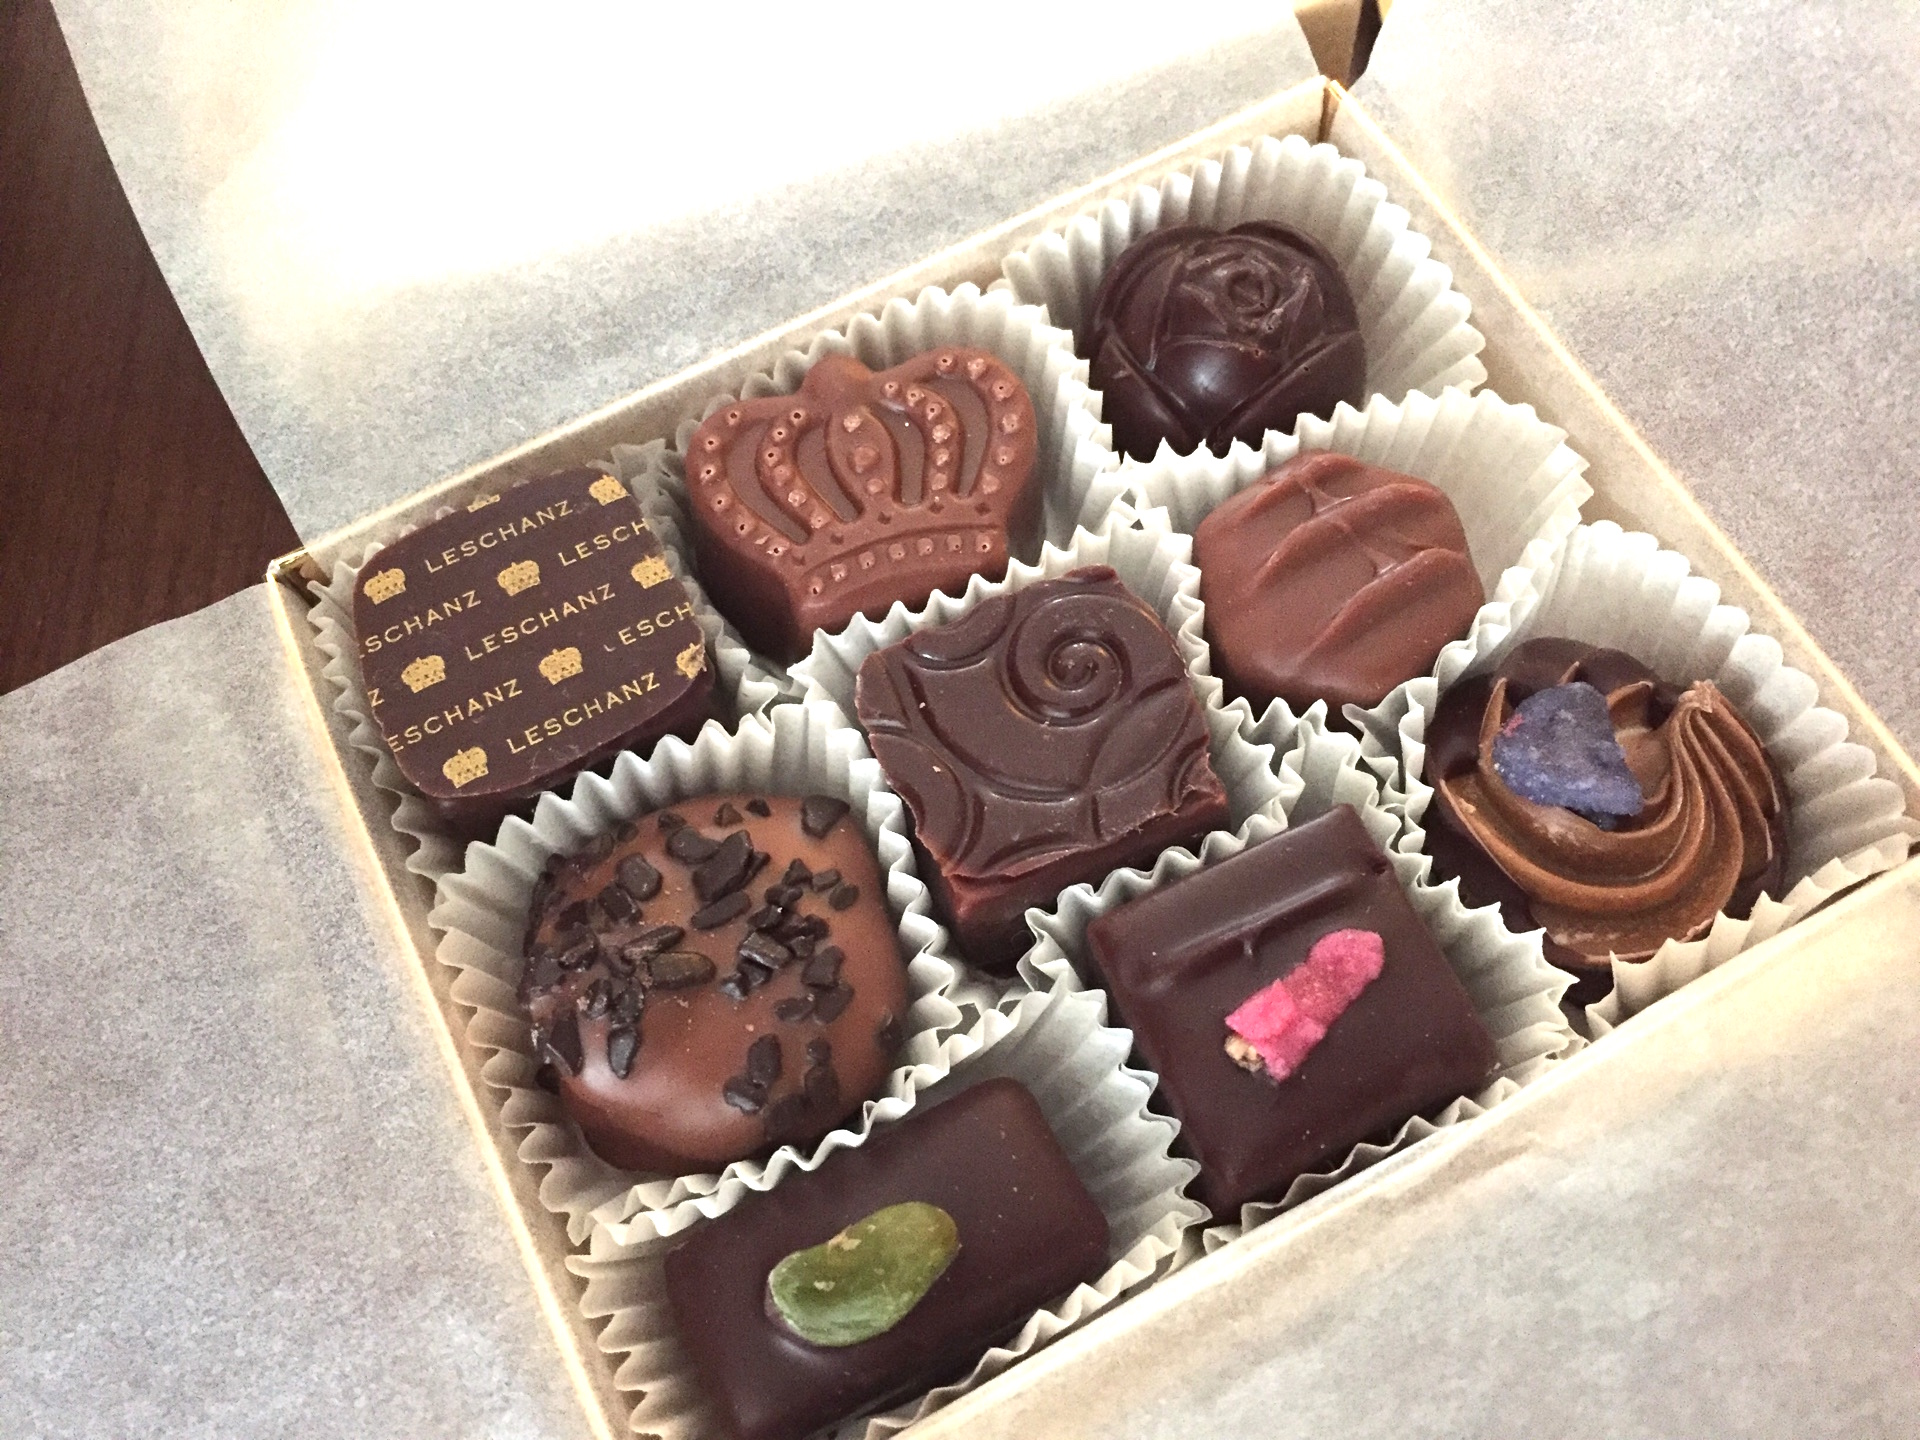 LESCHANZのチョコレートのお土産